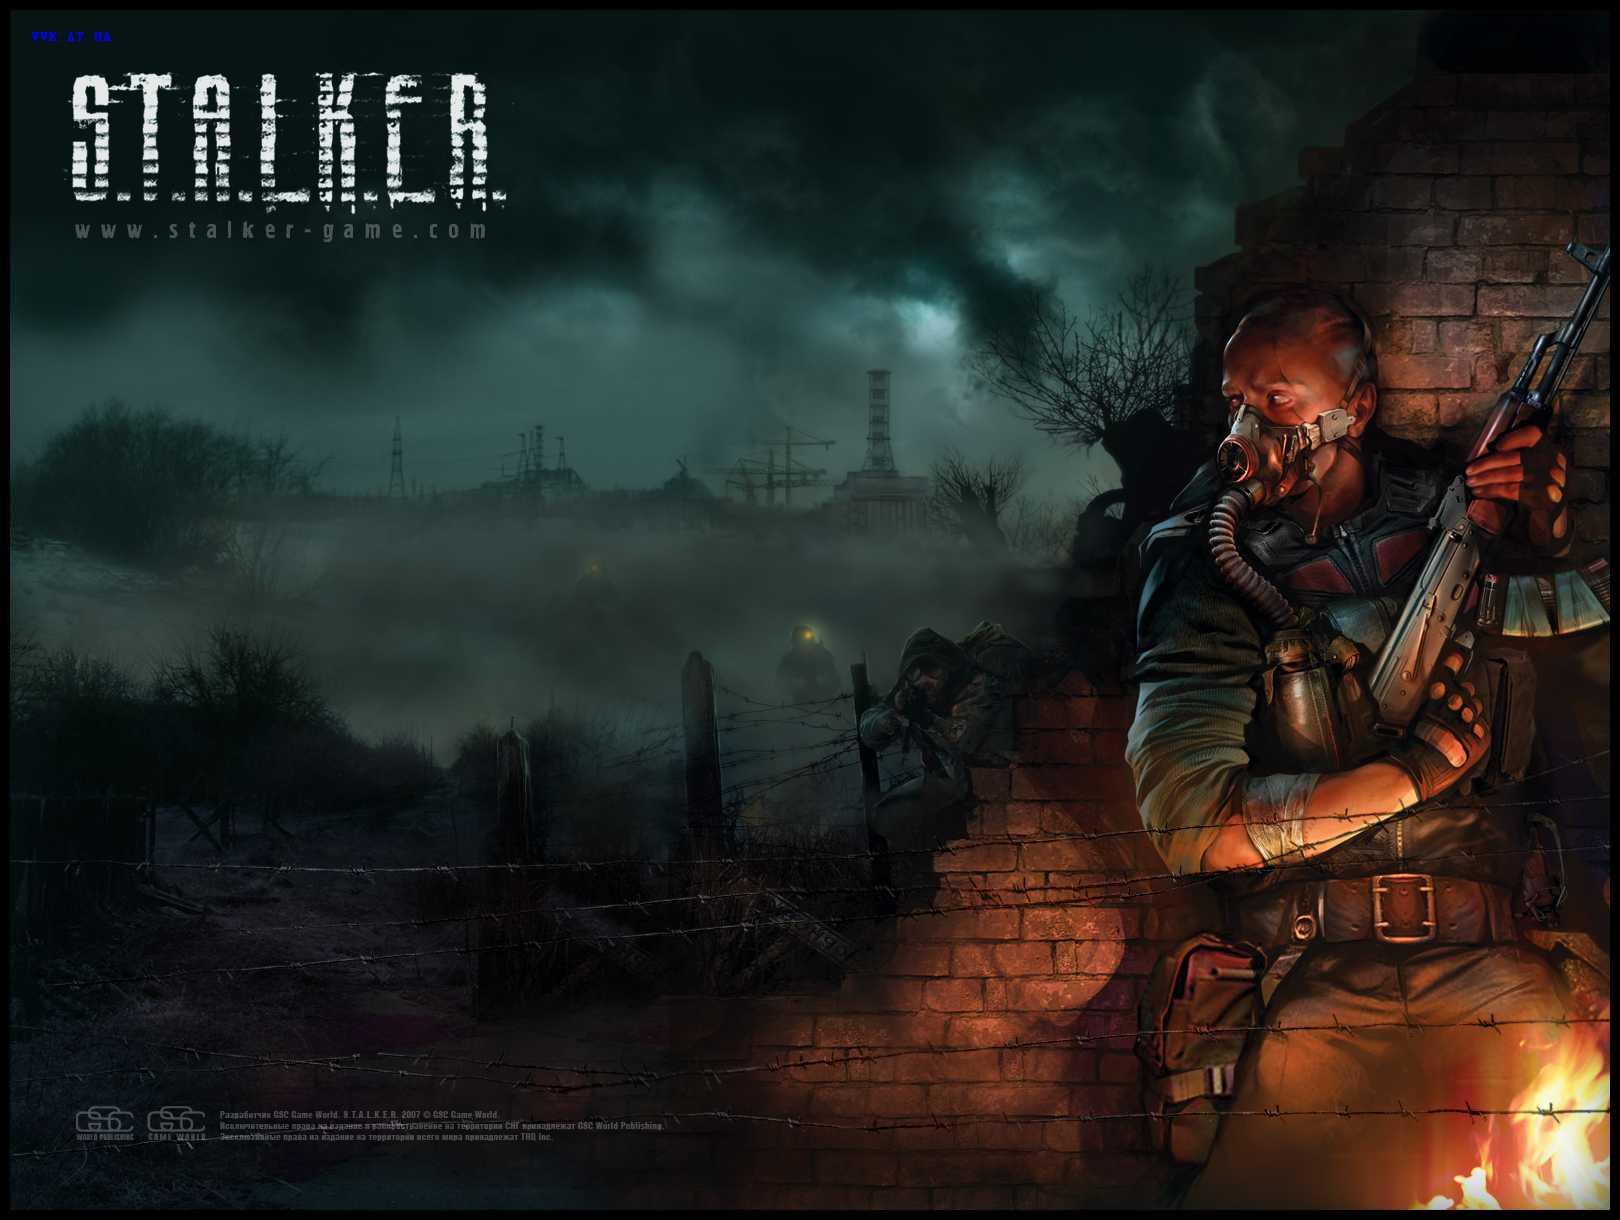 STALKER S.T.A.L.K.E.R. Shadow of Chernobyl Игры Обои и фото.